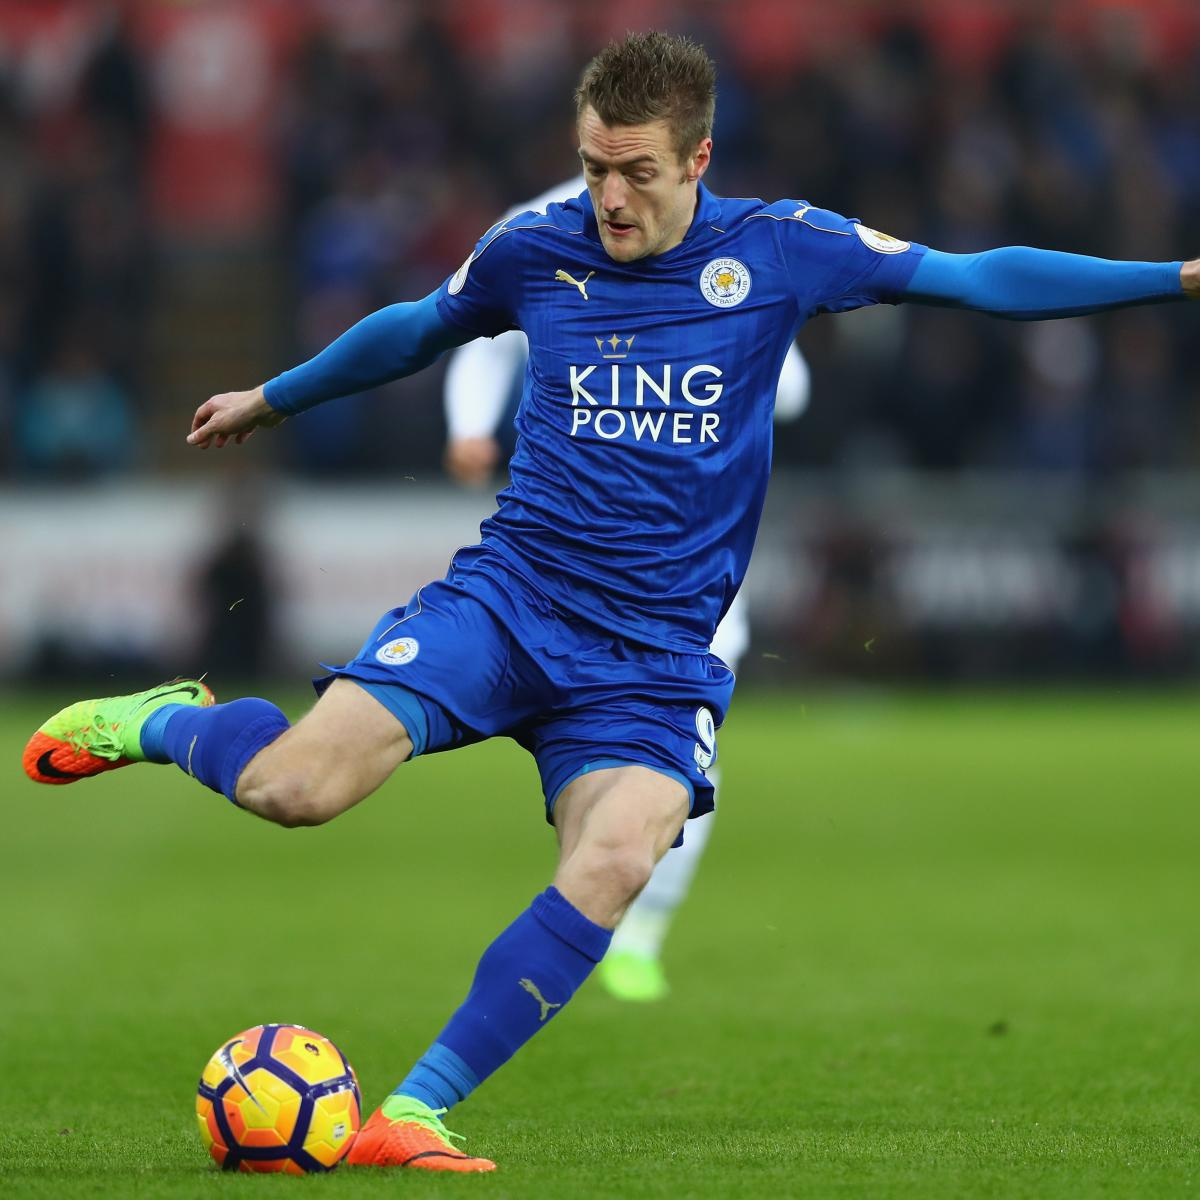 Champions League 2019 Round Of 16 Leg 2 Live Stream Tv: Sevilla Vs. Leicester City: Team News, Preview, Live